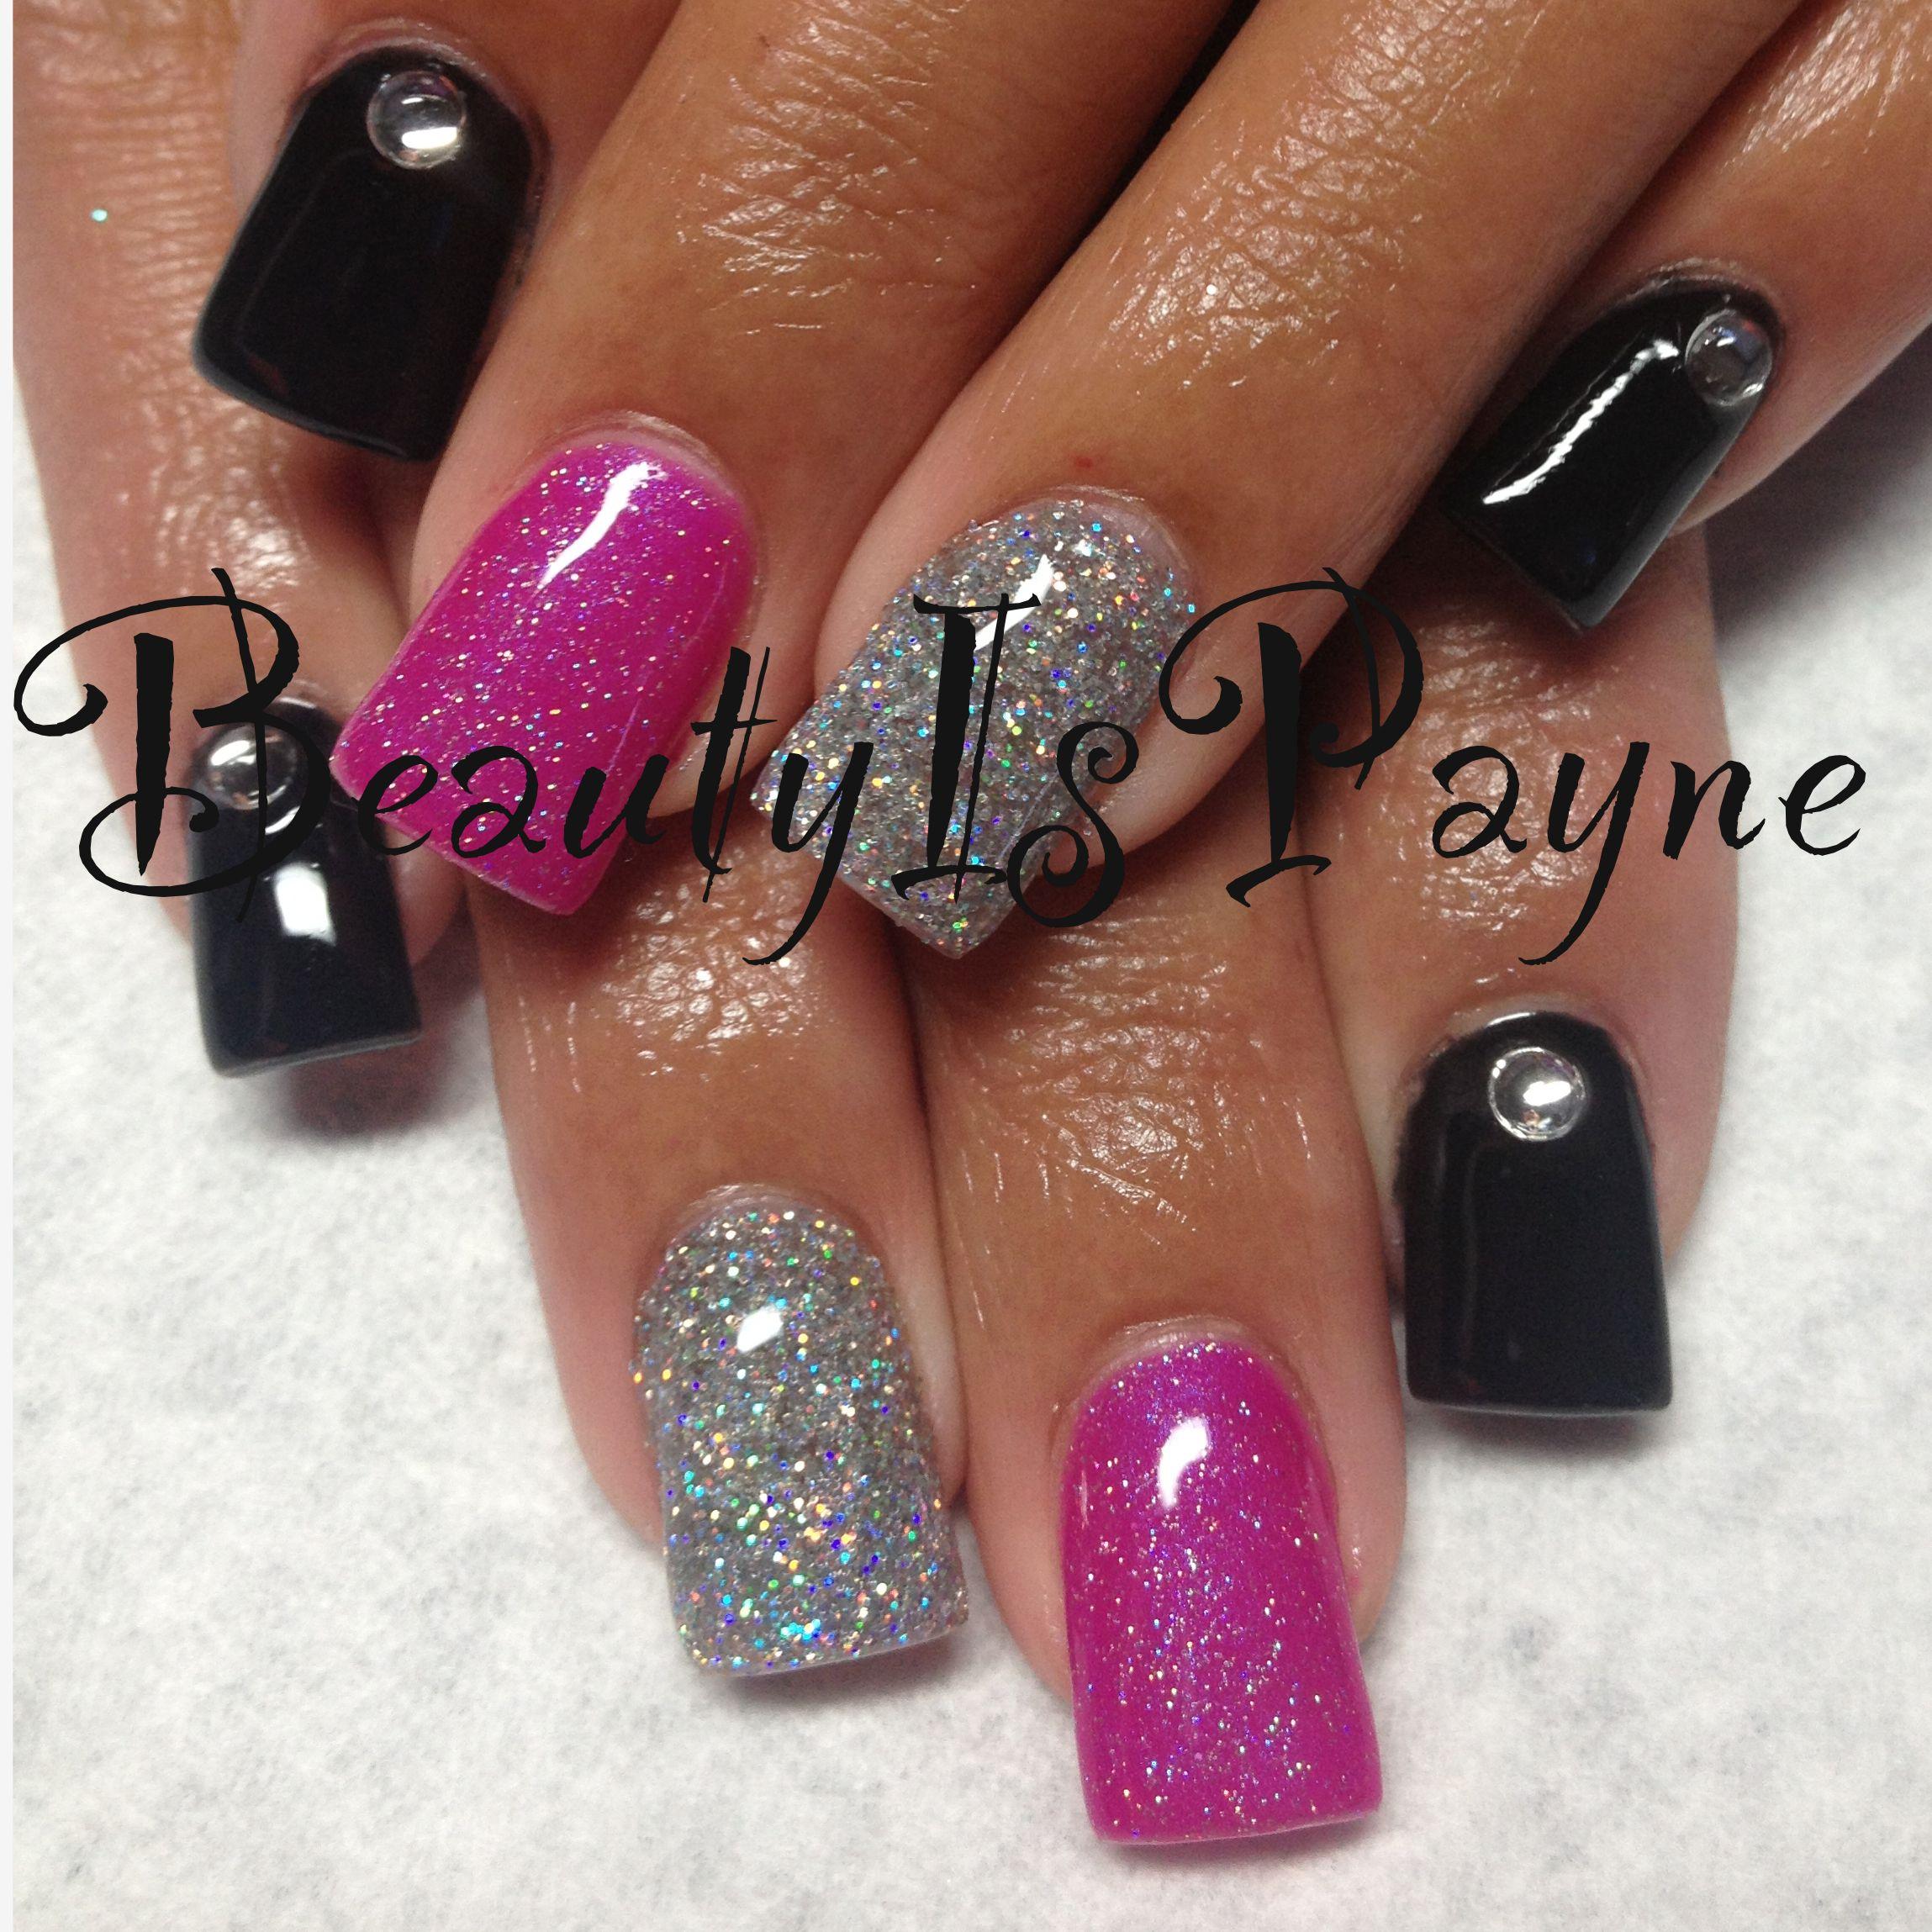 BeautyIsPayne shellac nails   Beauty is Payne   Pinterest   Diseños ...